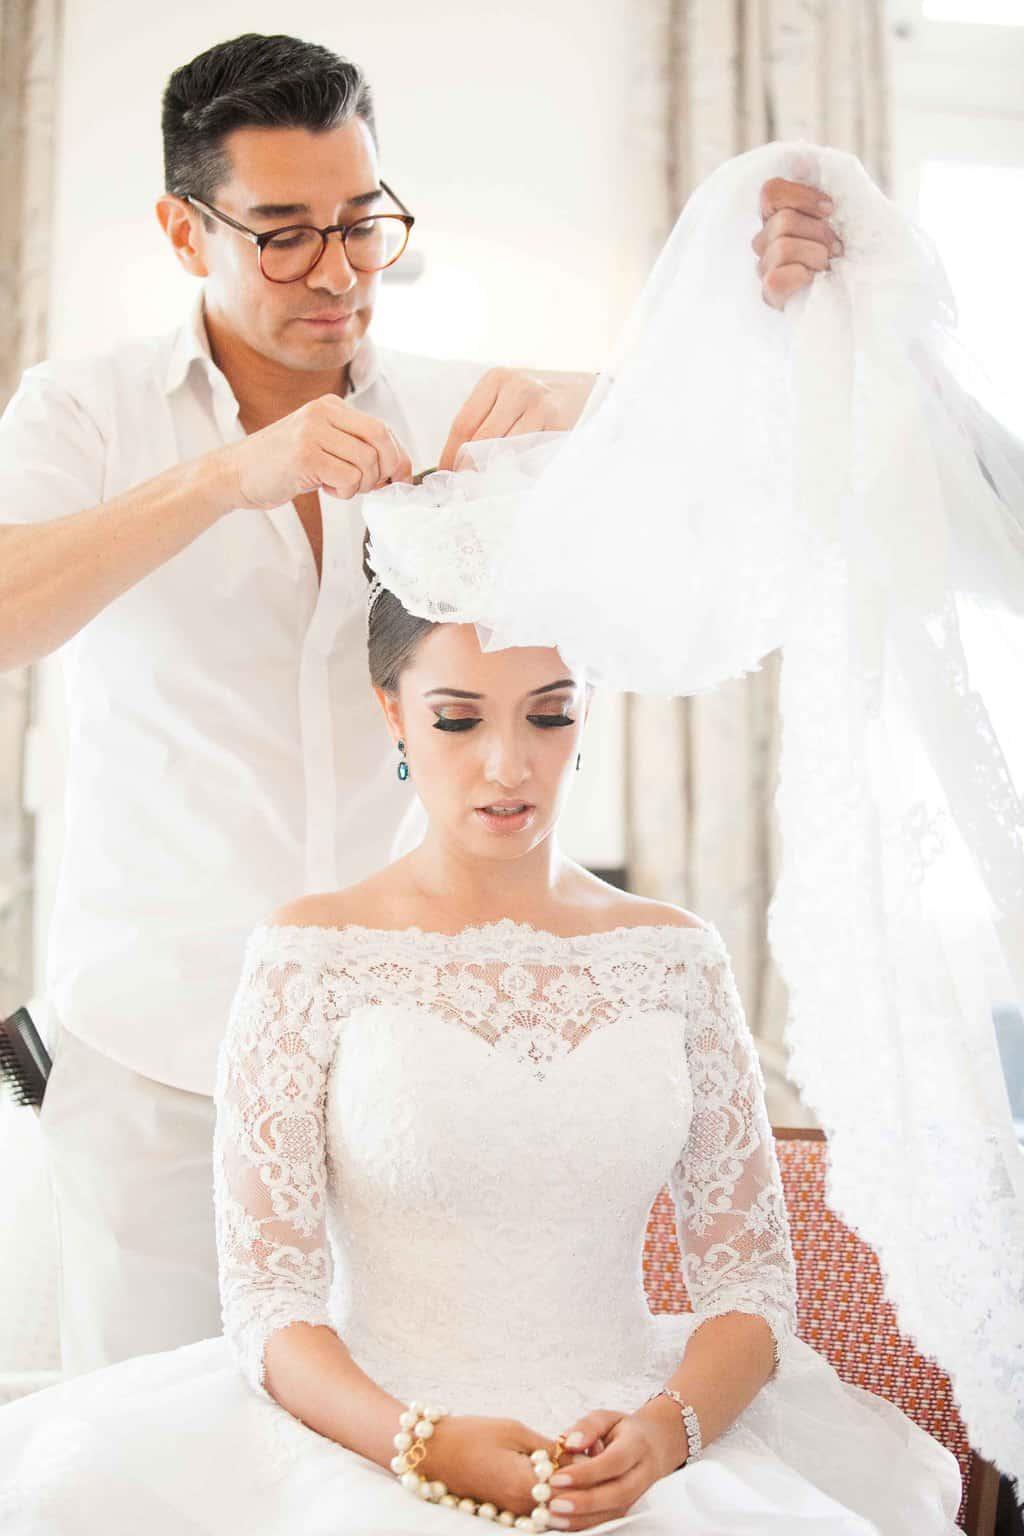 Casamento-Clássico-Casamento-tradicional-Copacabana-Palace-Marcelo-Hicho-Monica-Roias-Ribas-Foto-e-Vídeo-Silvio-Cruz-Tuanny-e-Bernardo-CaseMe-2